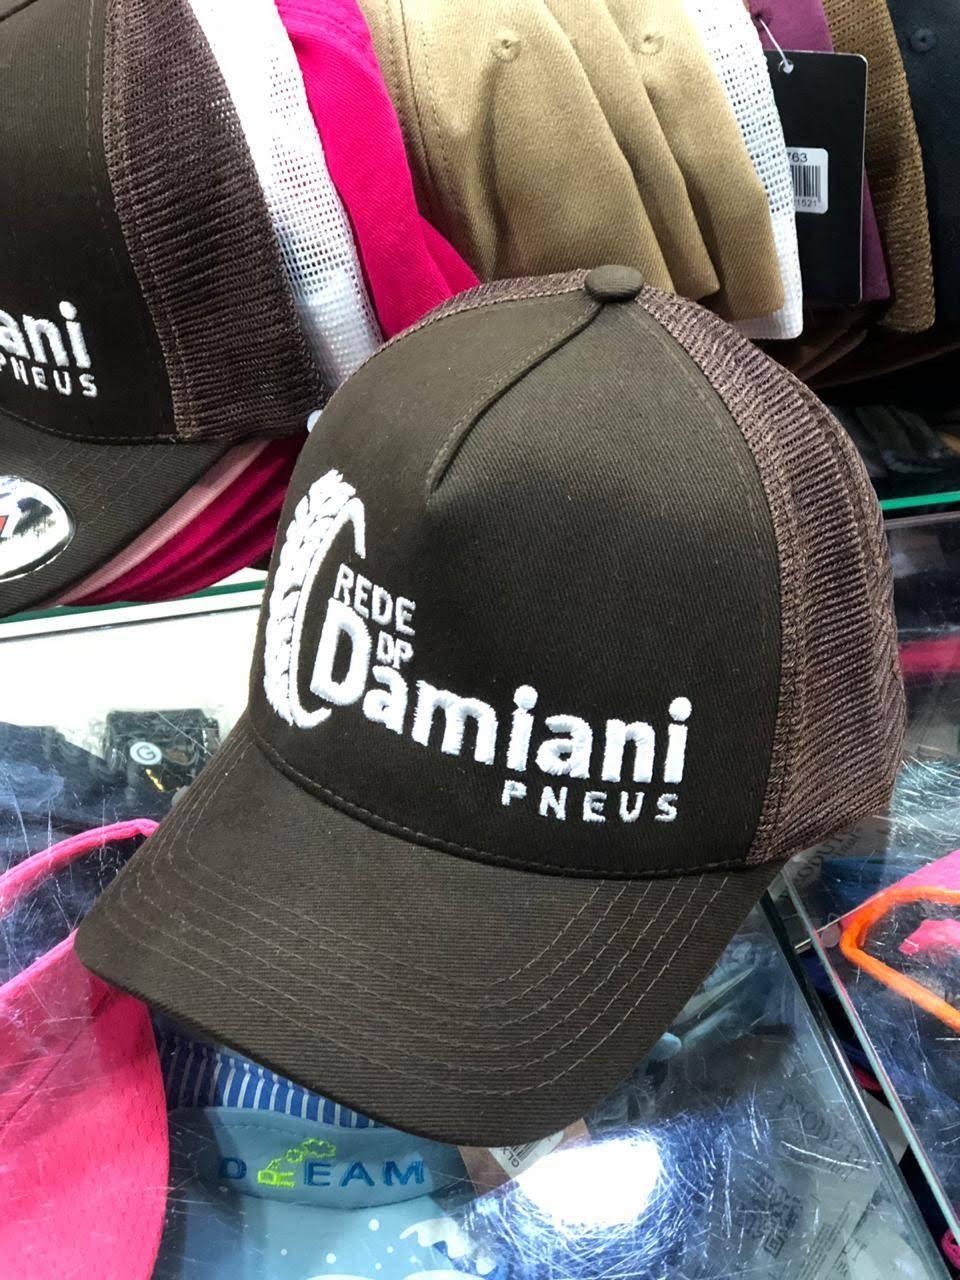 damiani_pneus_bone (22)